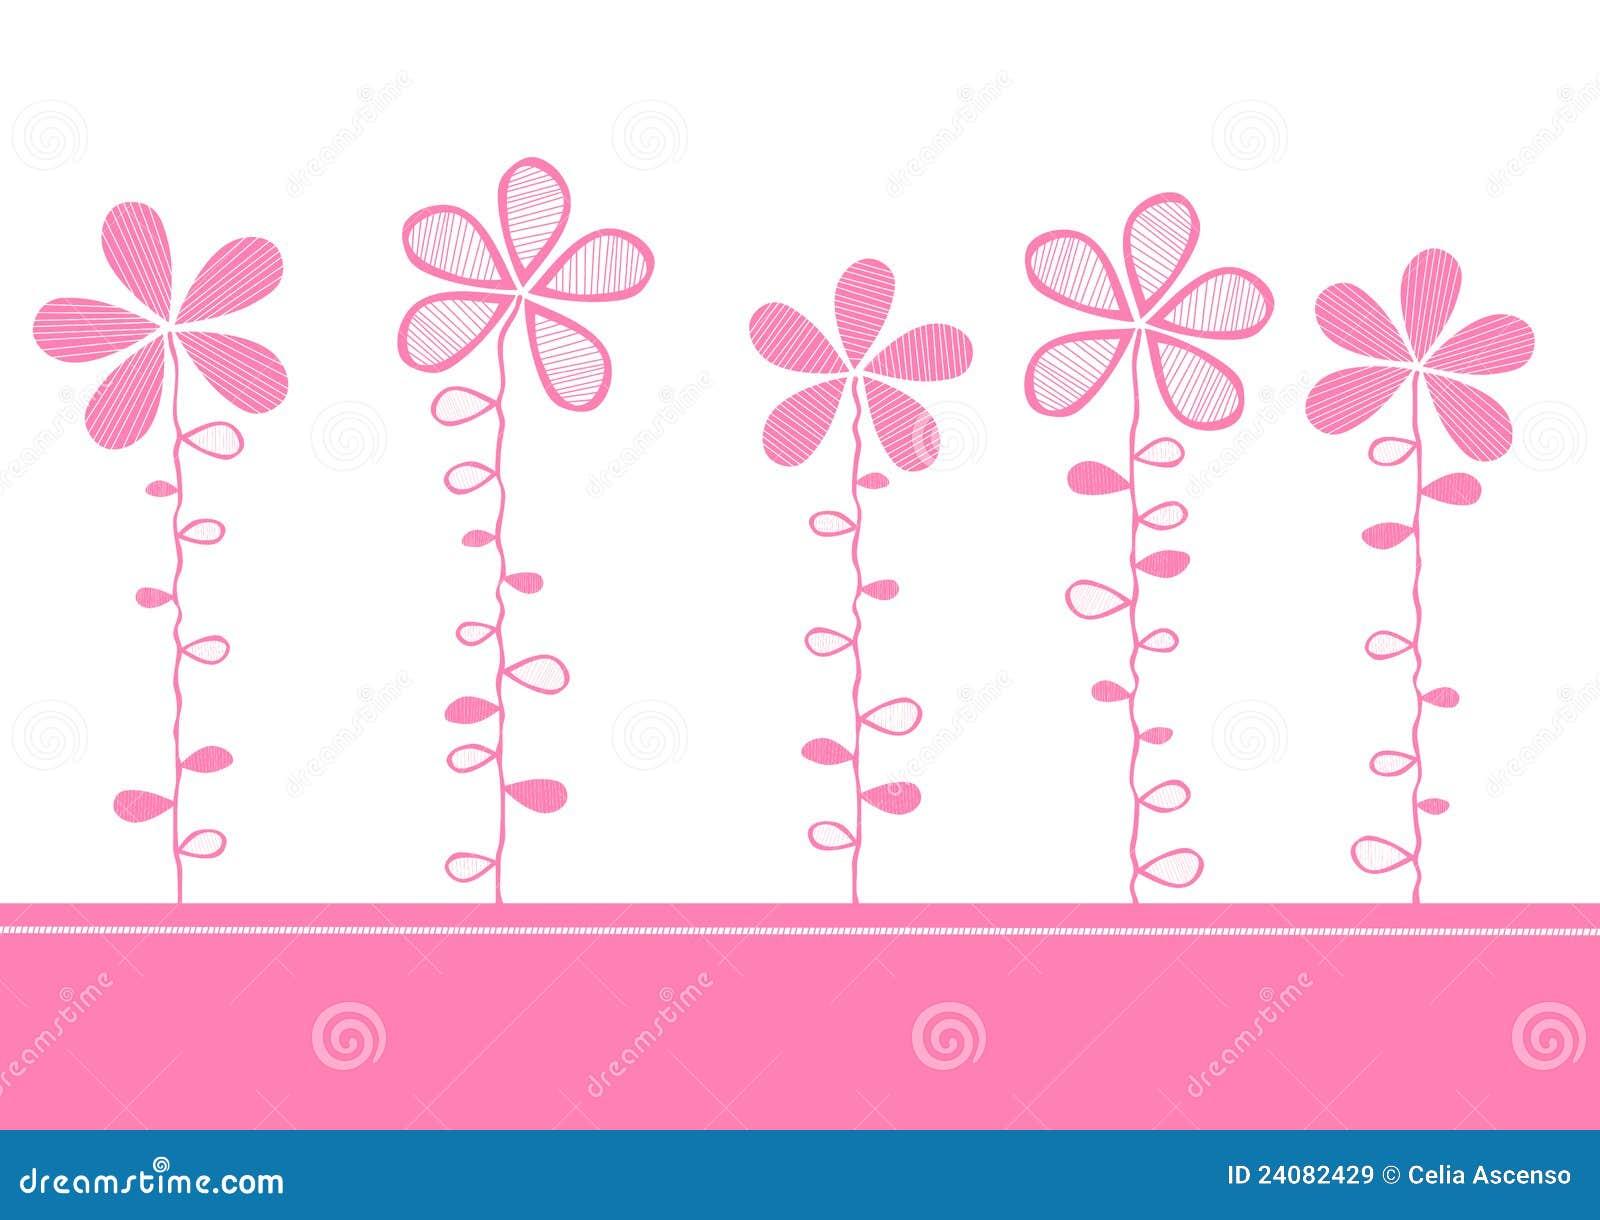 Pink Flowers Invitation Card Stock Illustration - Image ...